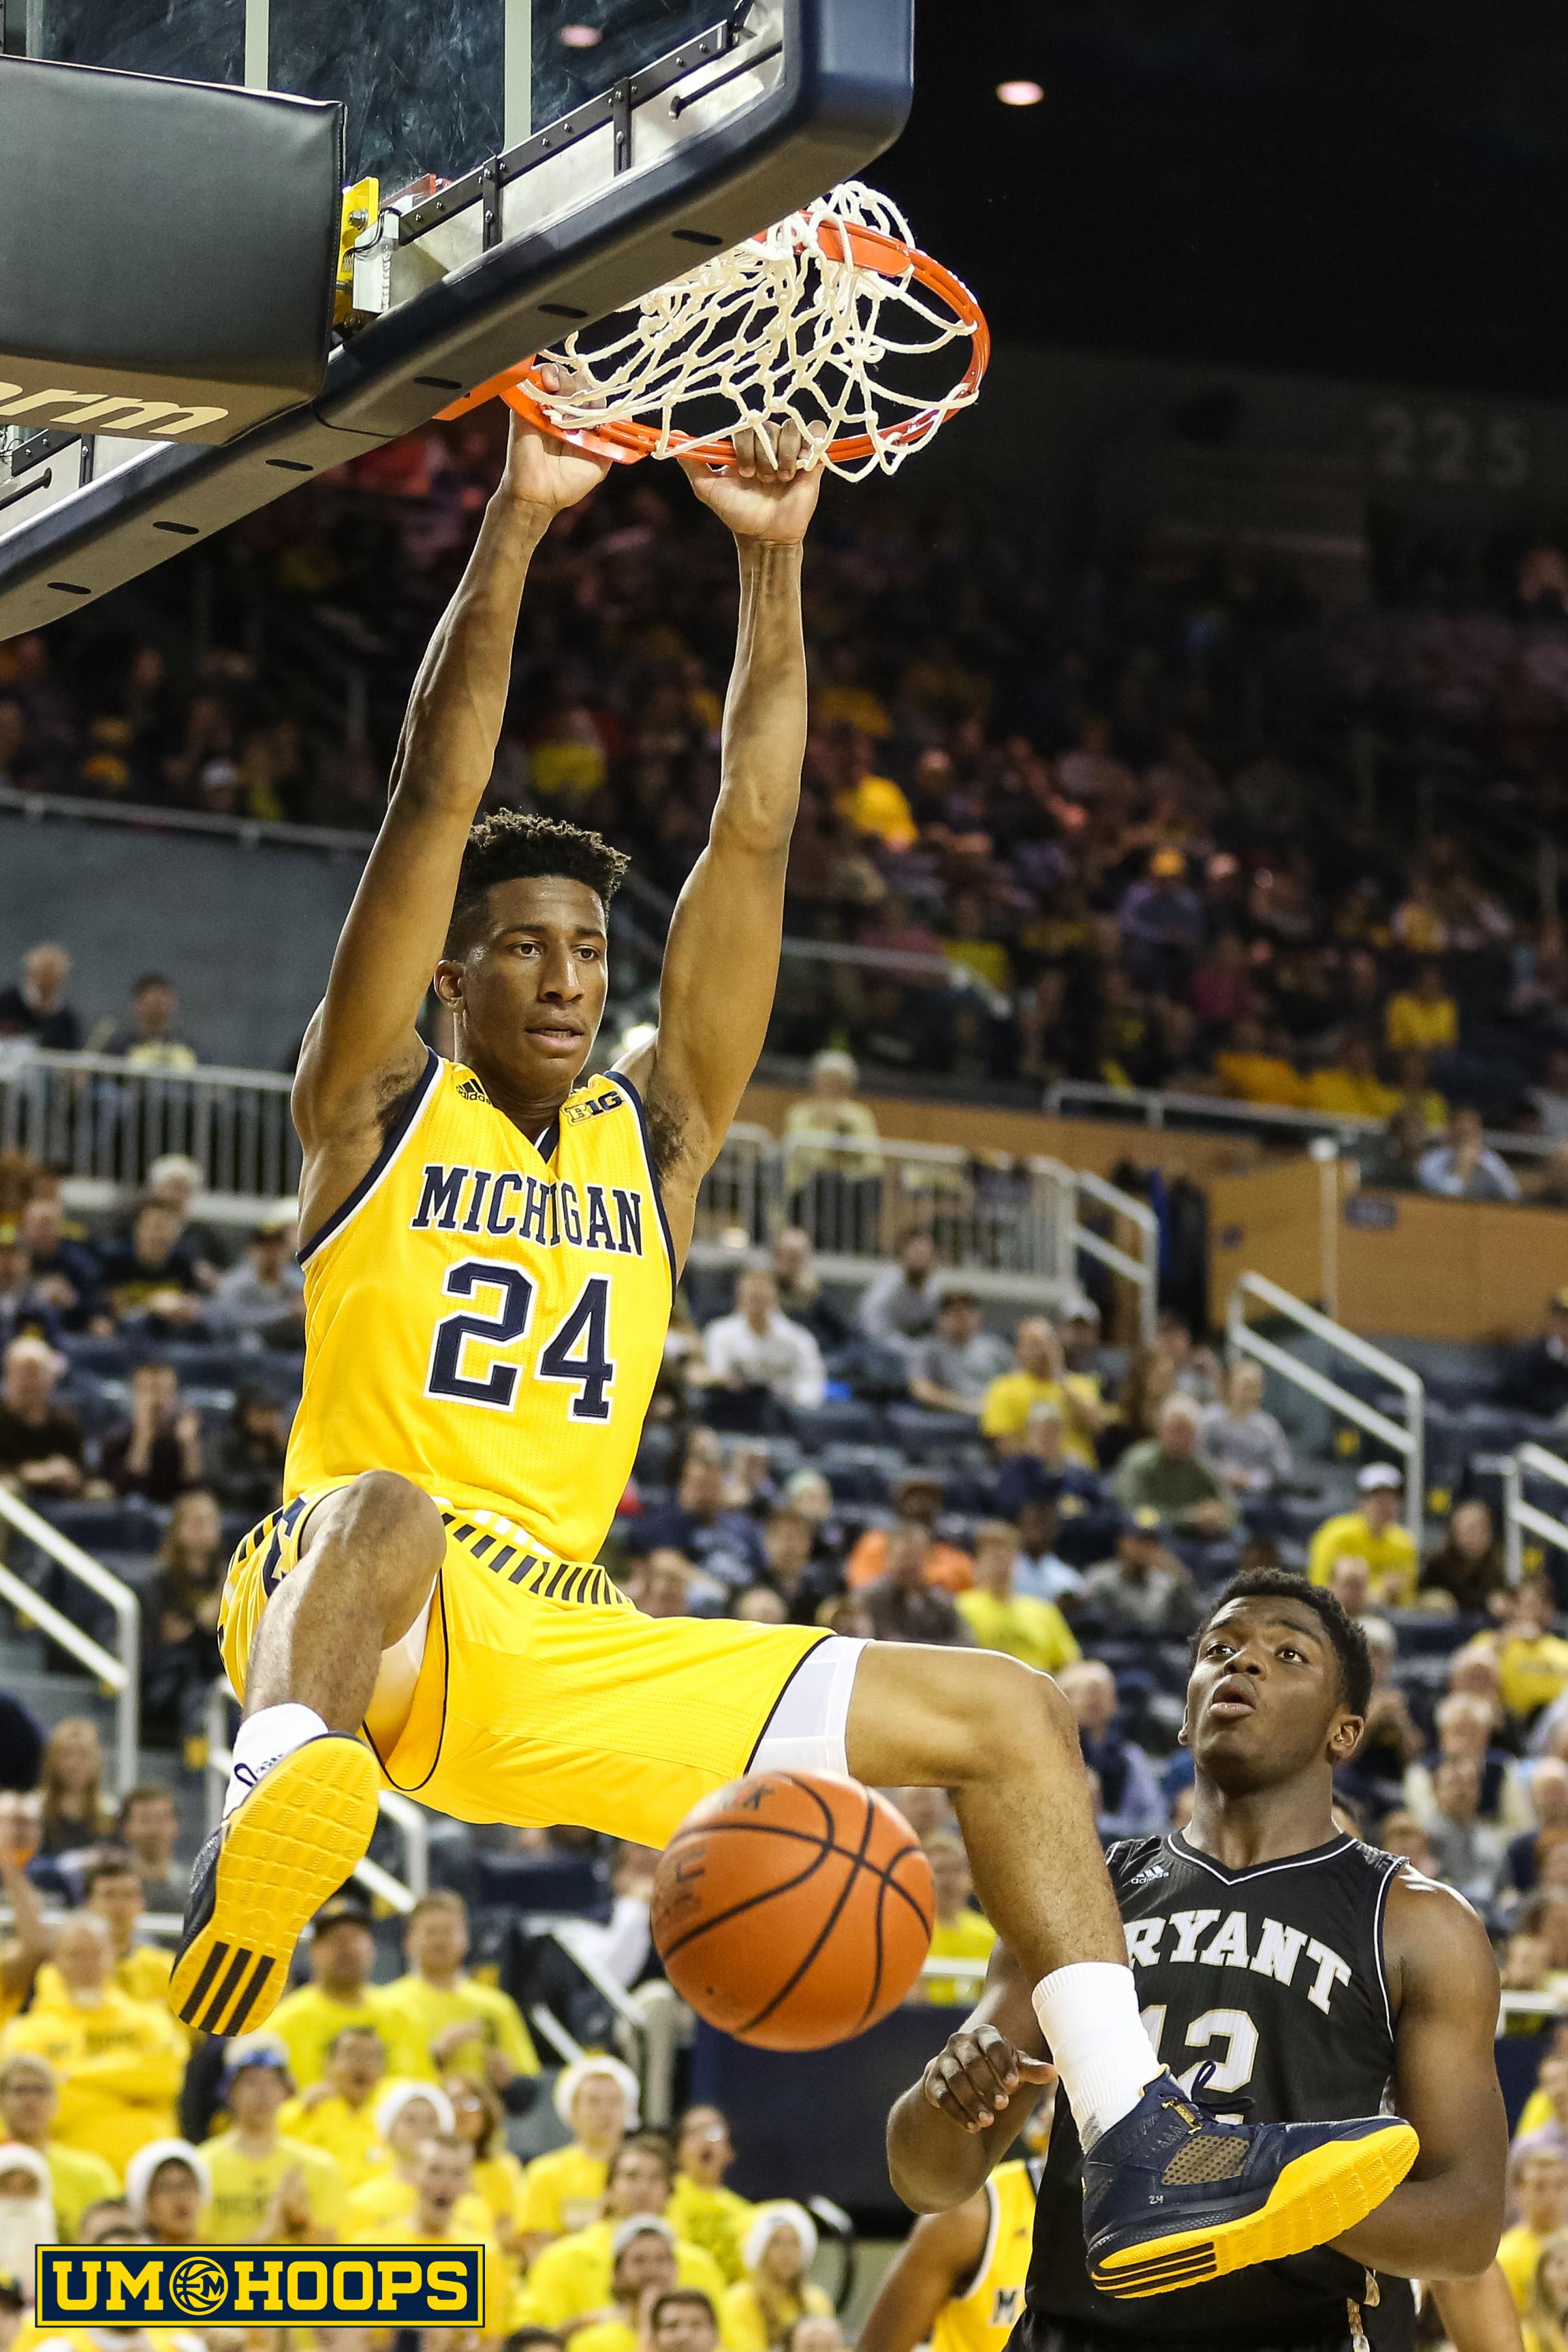 Michigan 96, Bryant 60-24